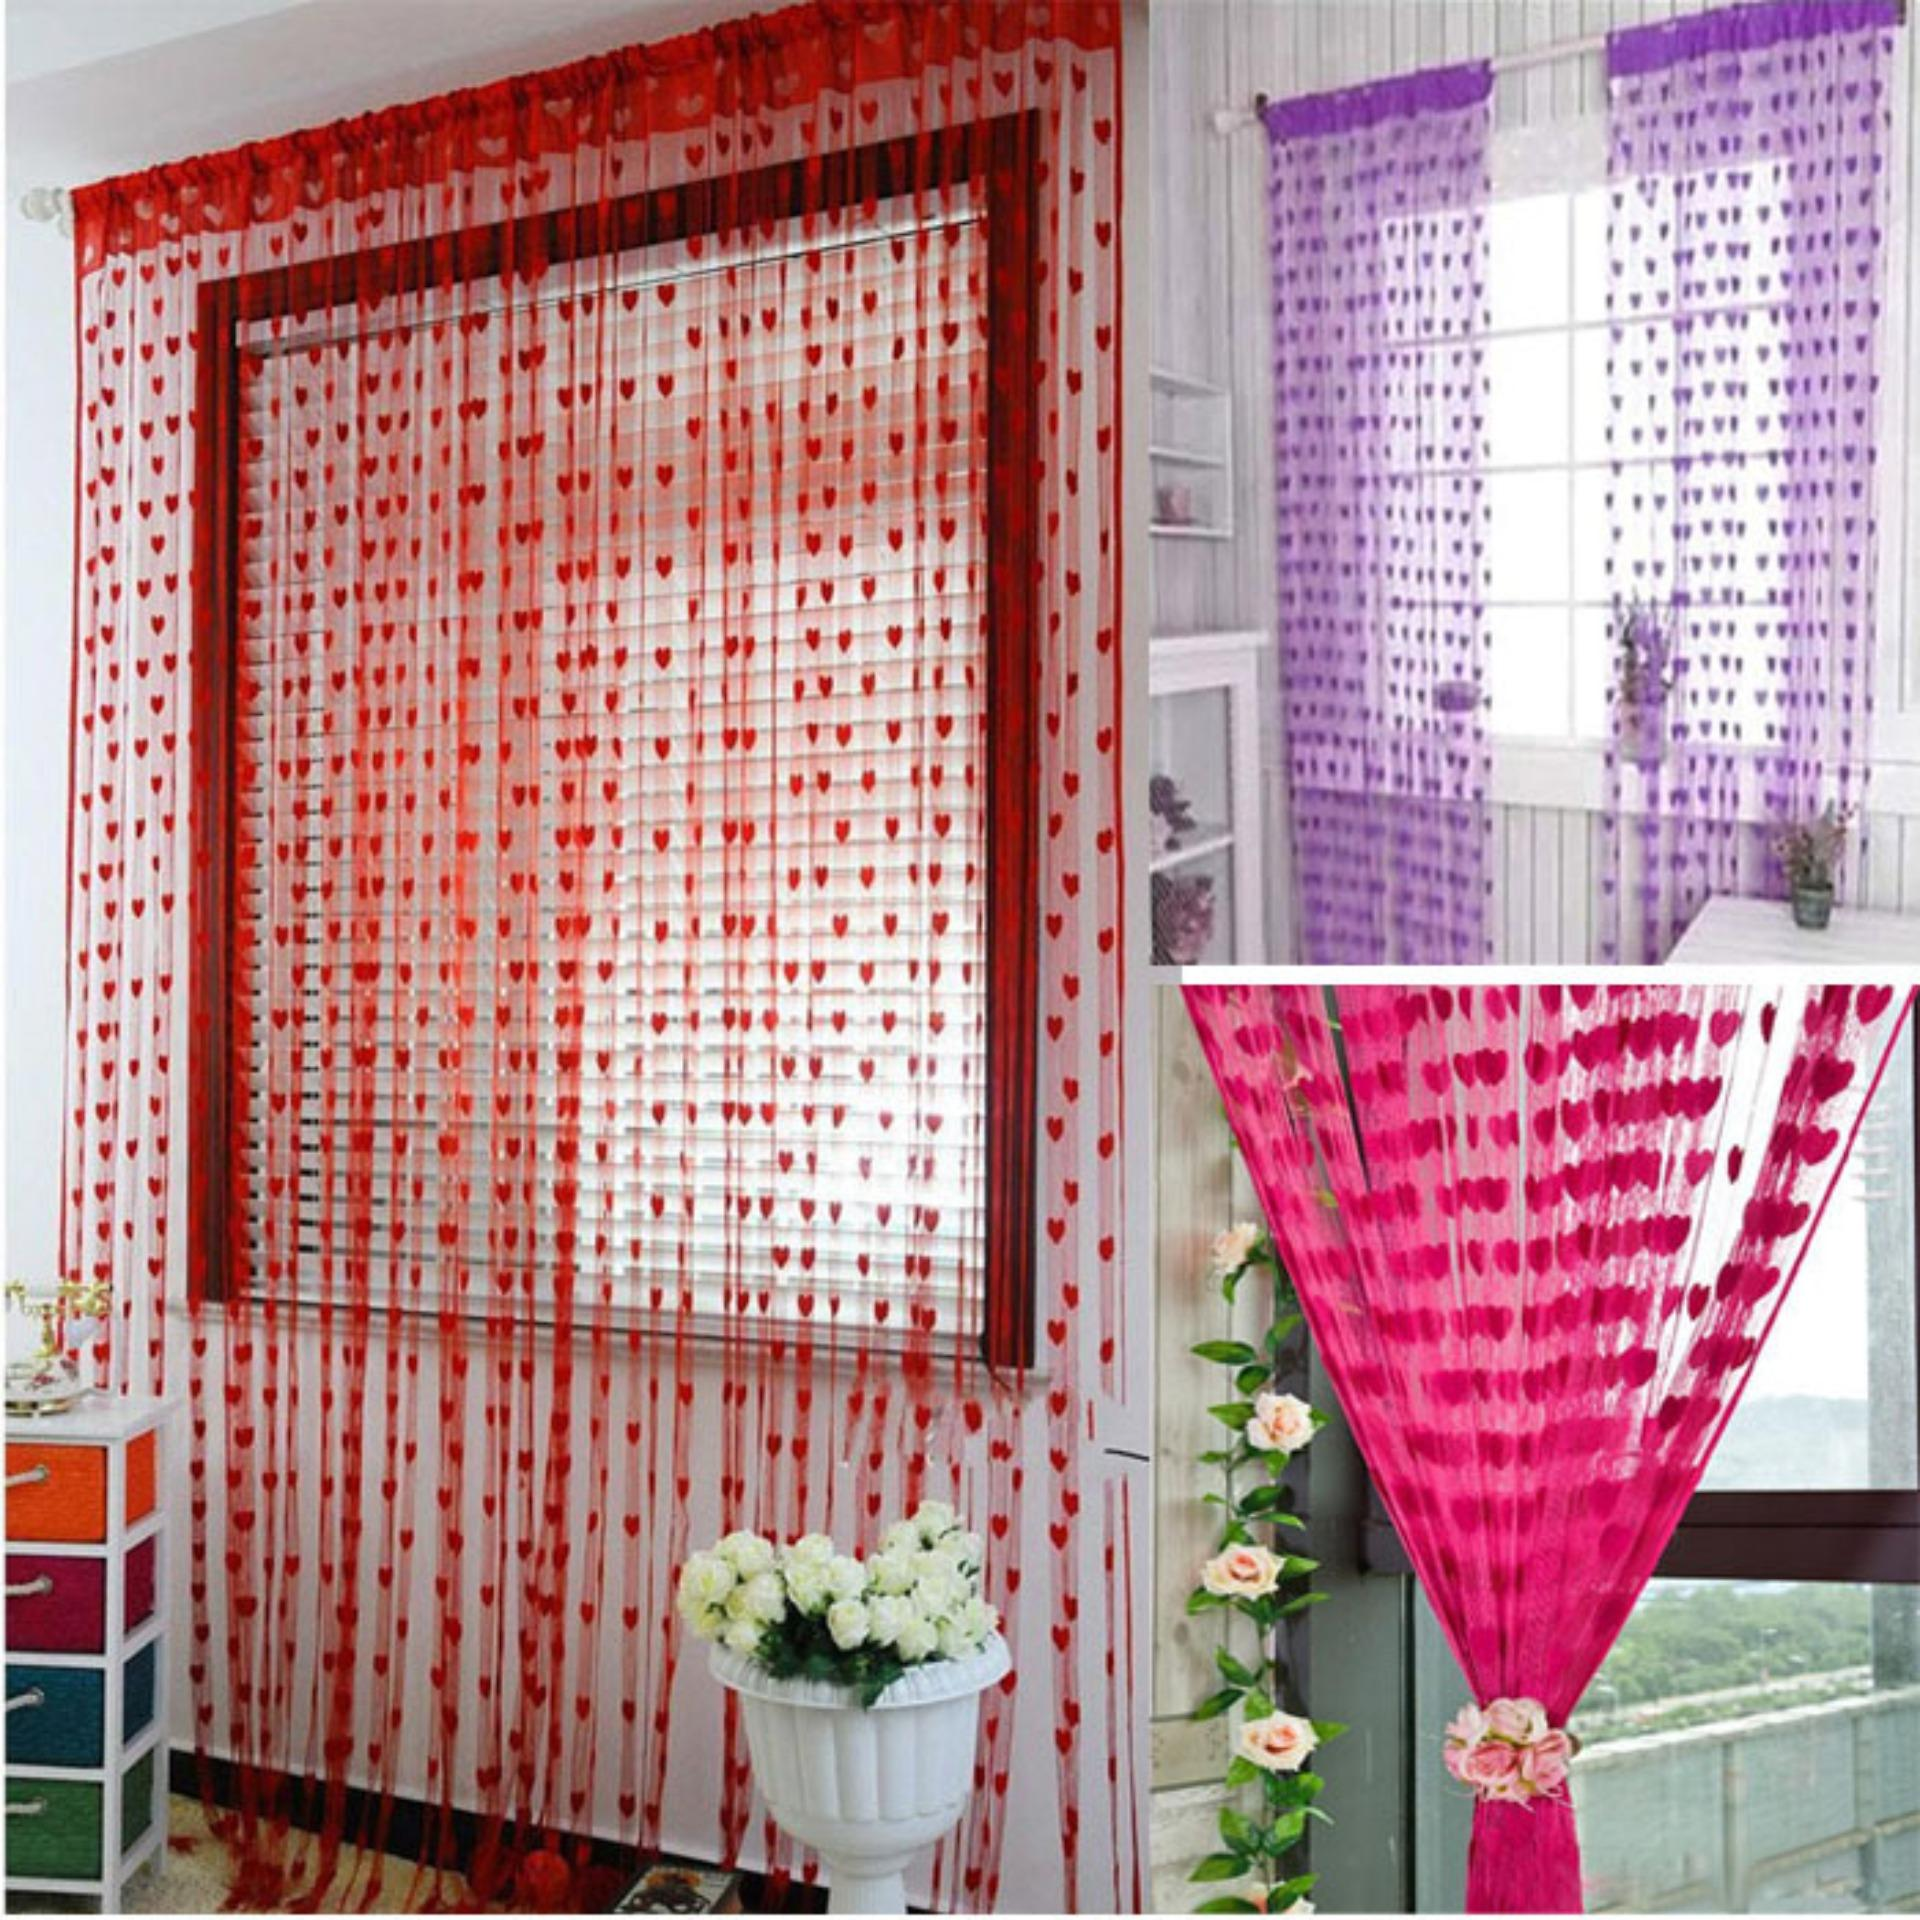 Tirai Benang Jendela dan Pintu